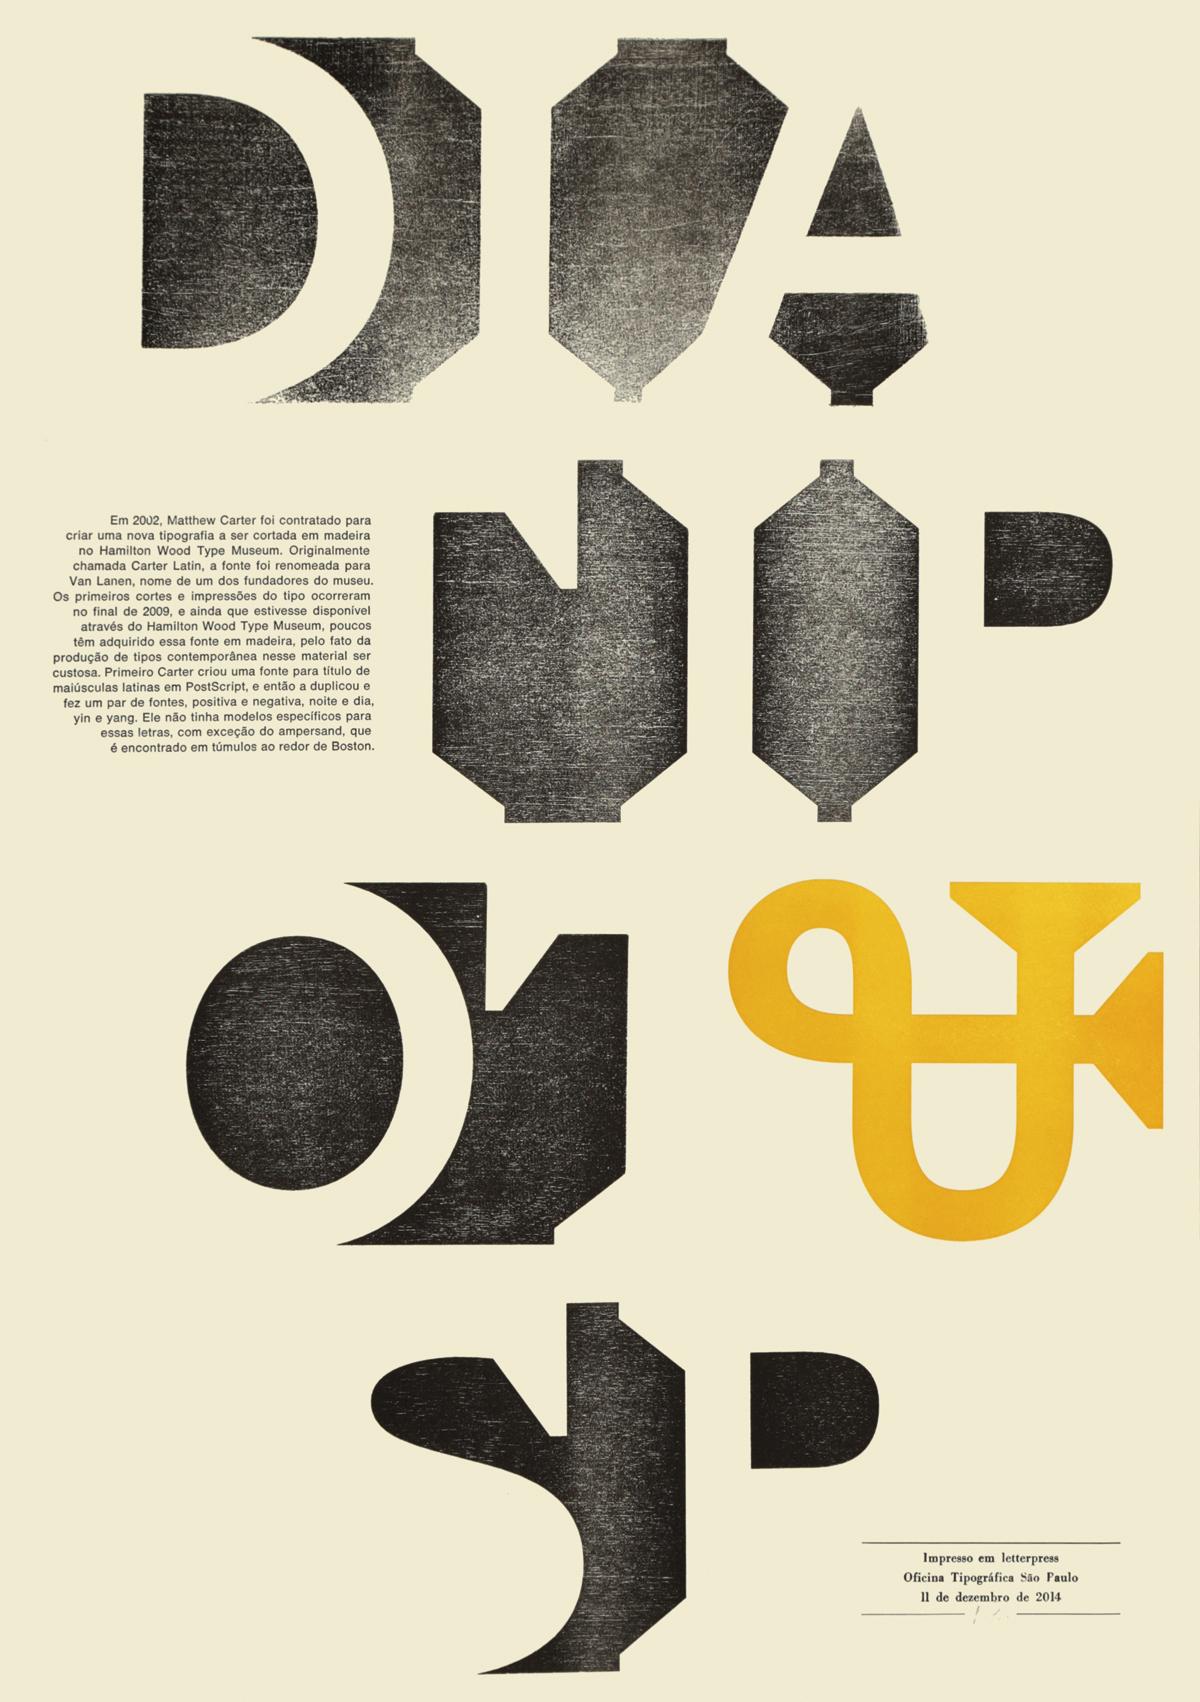 oficina-tipografica_EDIT